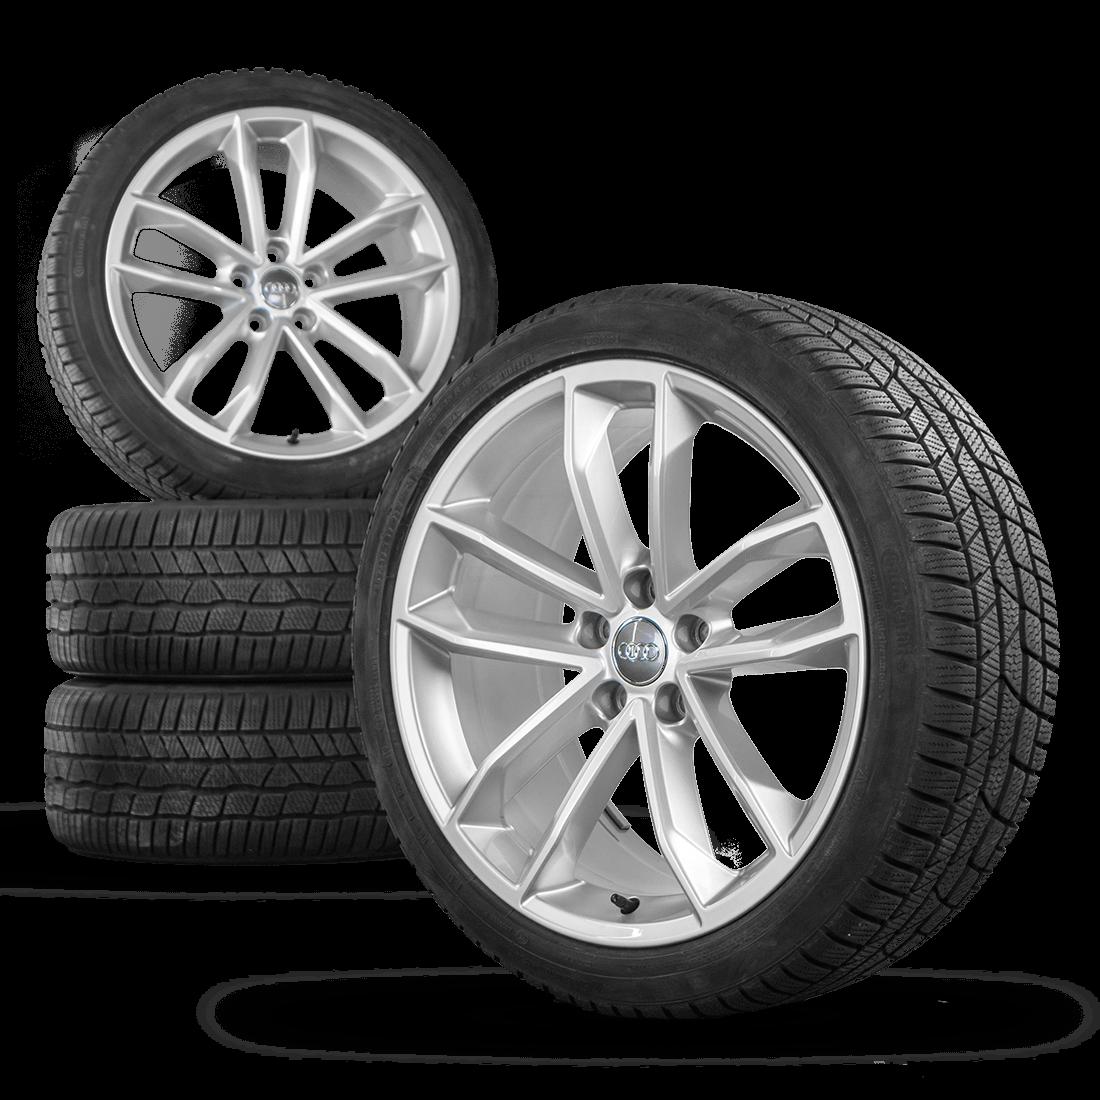 Audi A5 S5 8W F5 19 Inch Alloy Wheels Rim Winter Tyres Winter